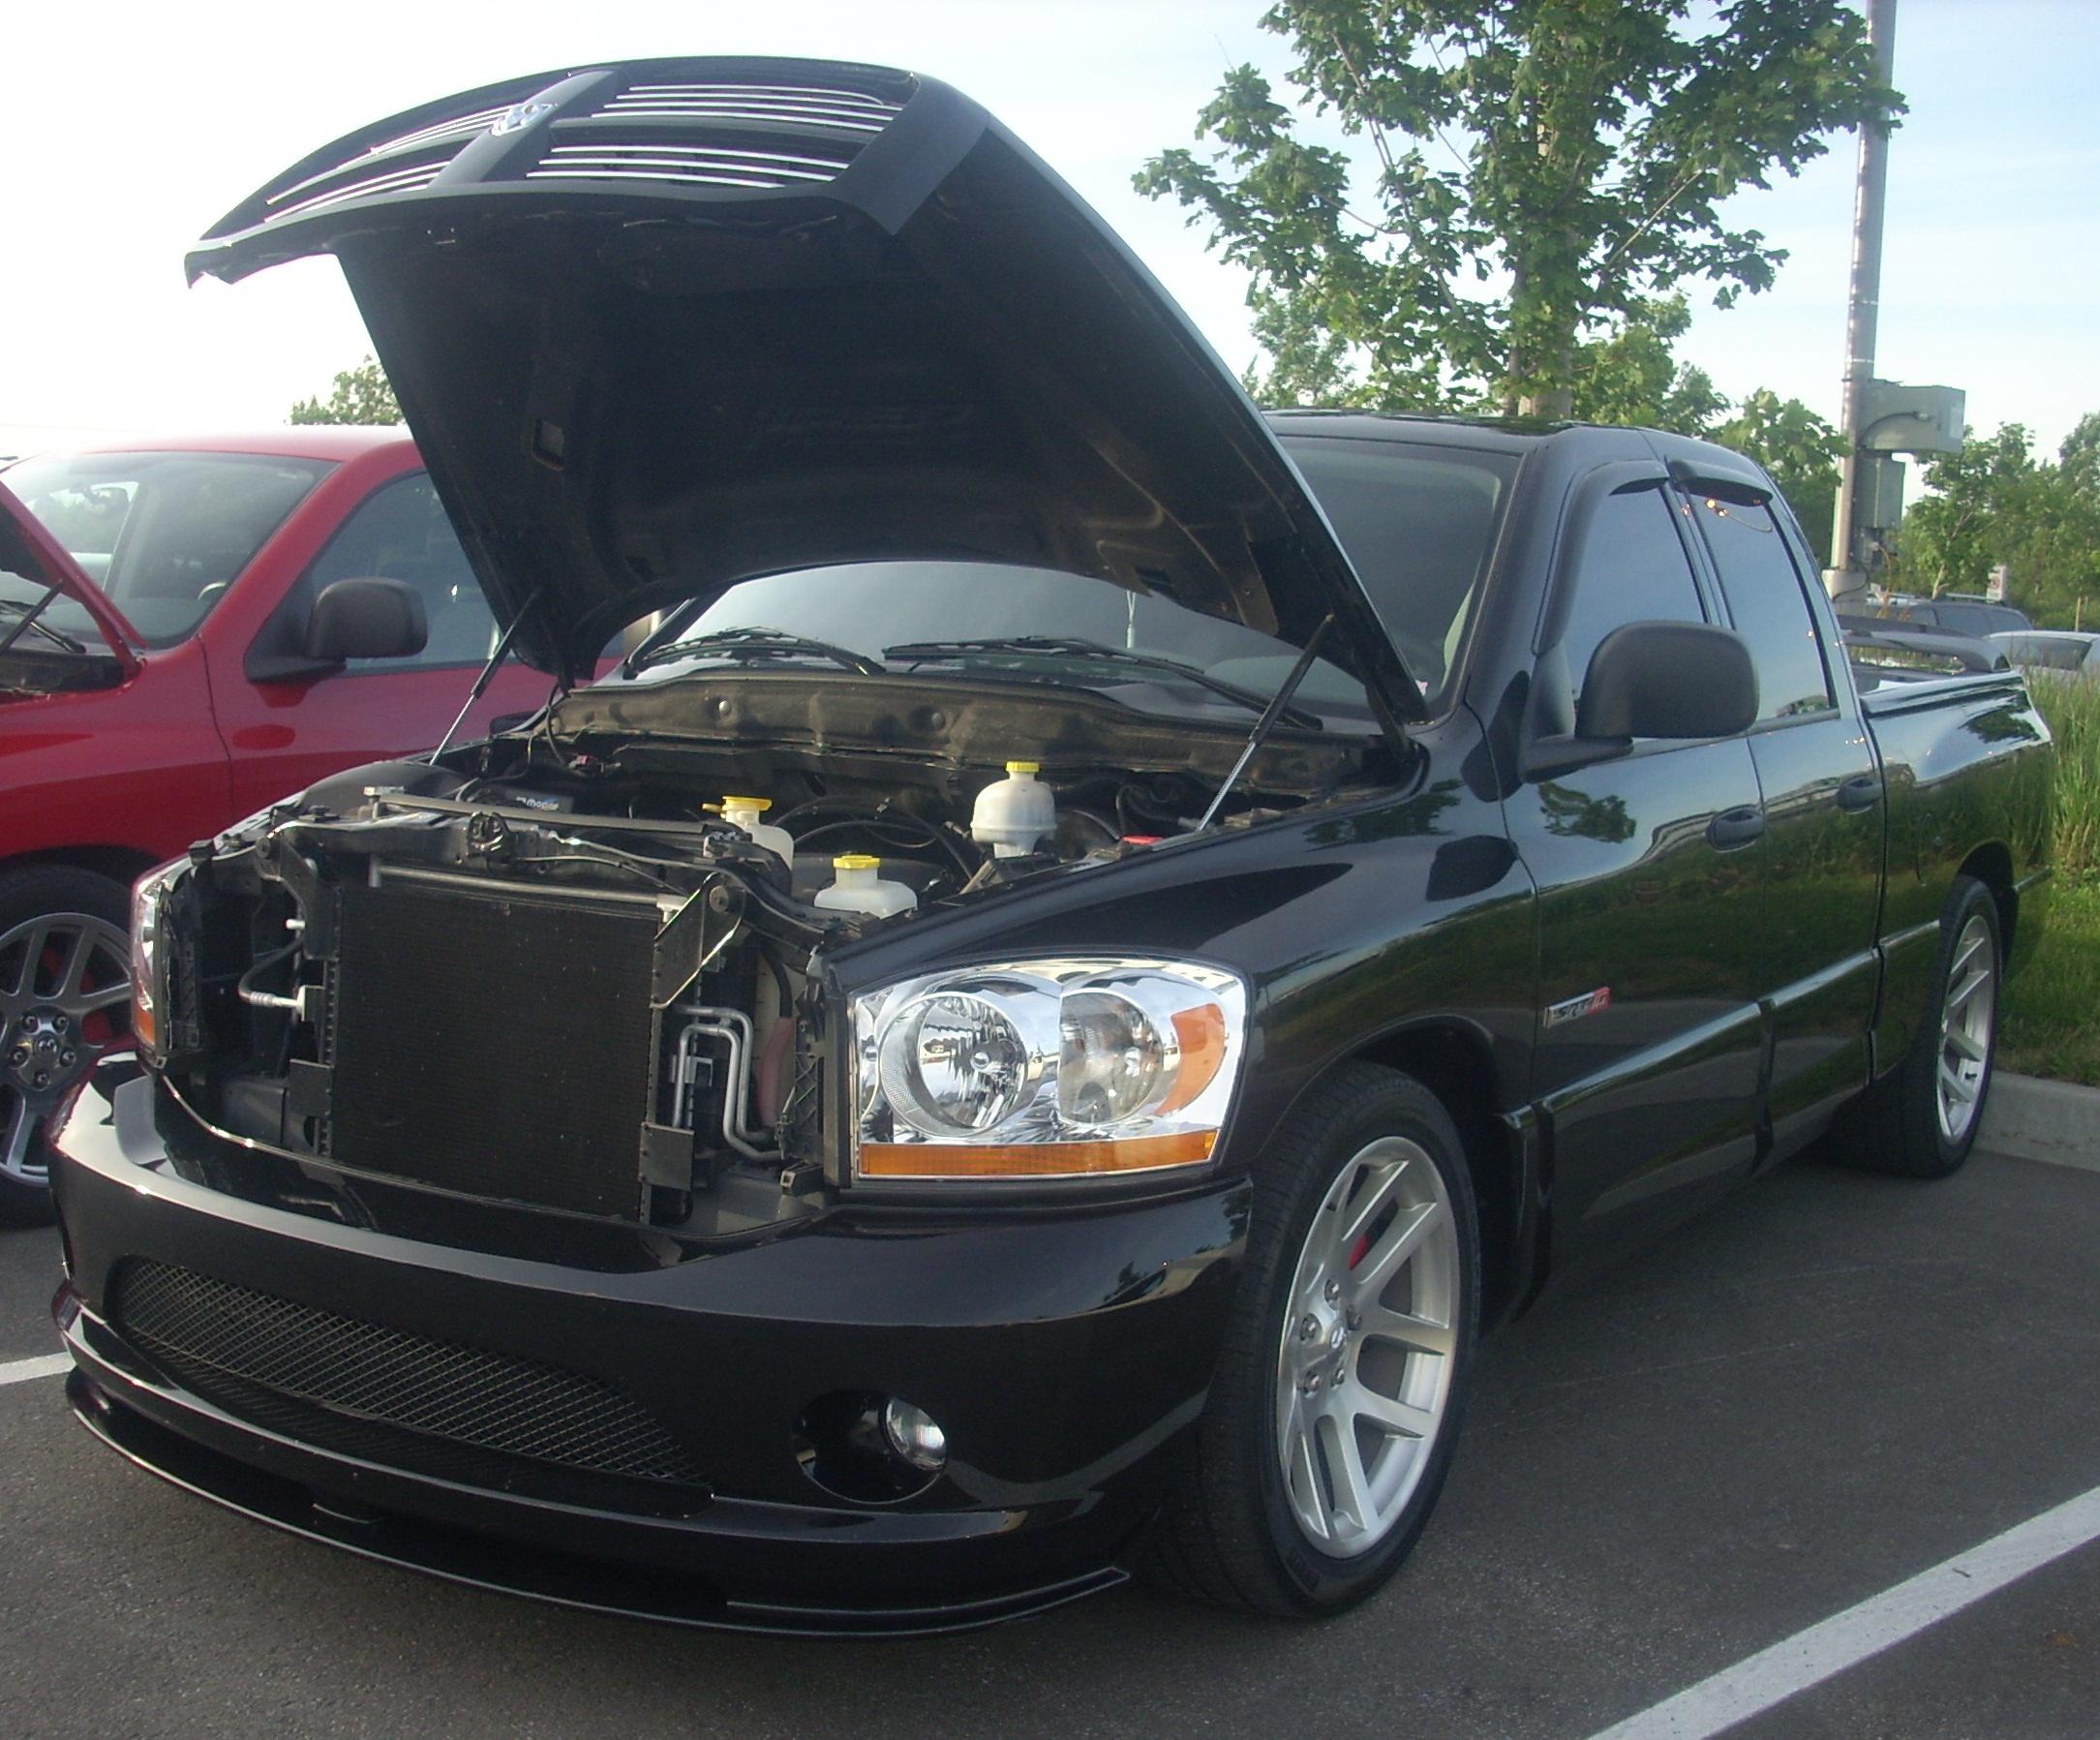 2015 Dodge Ram 1500 4x4 Curb Weight | Autos Post